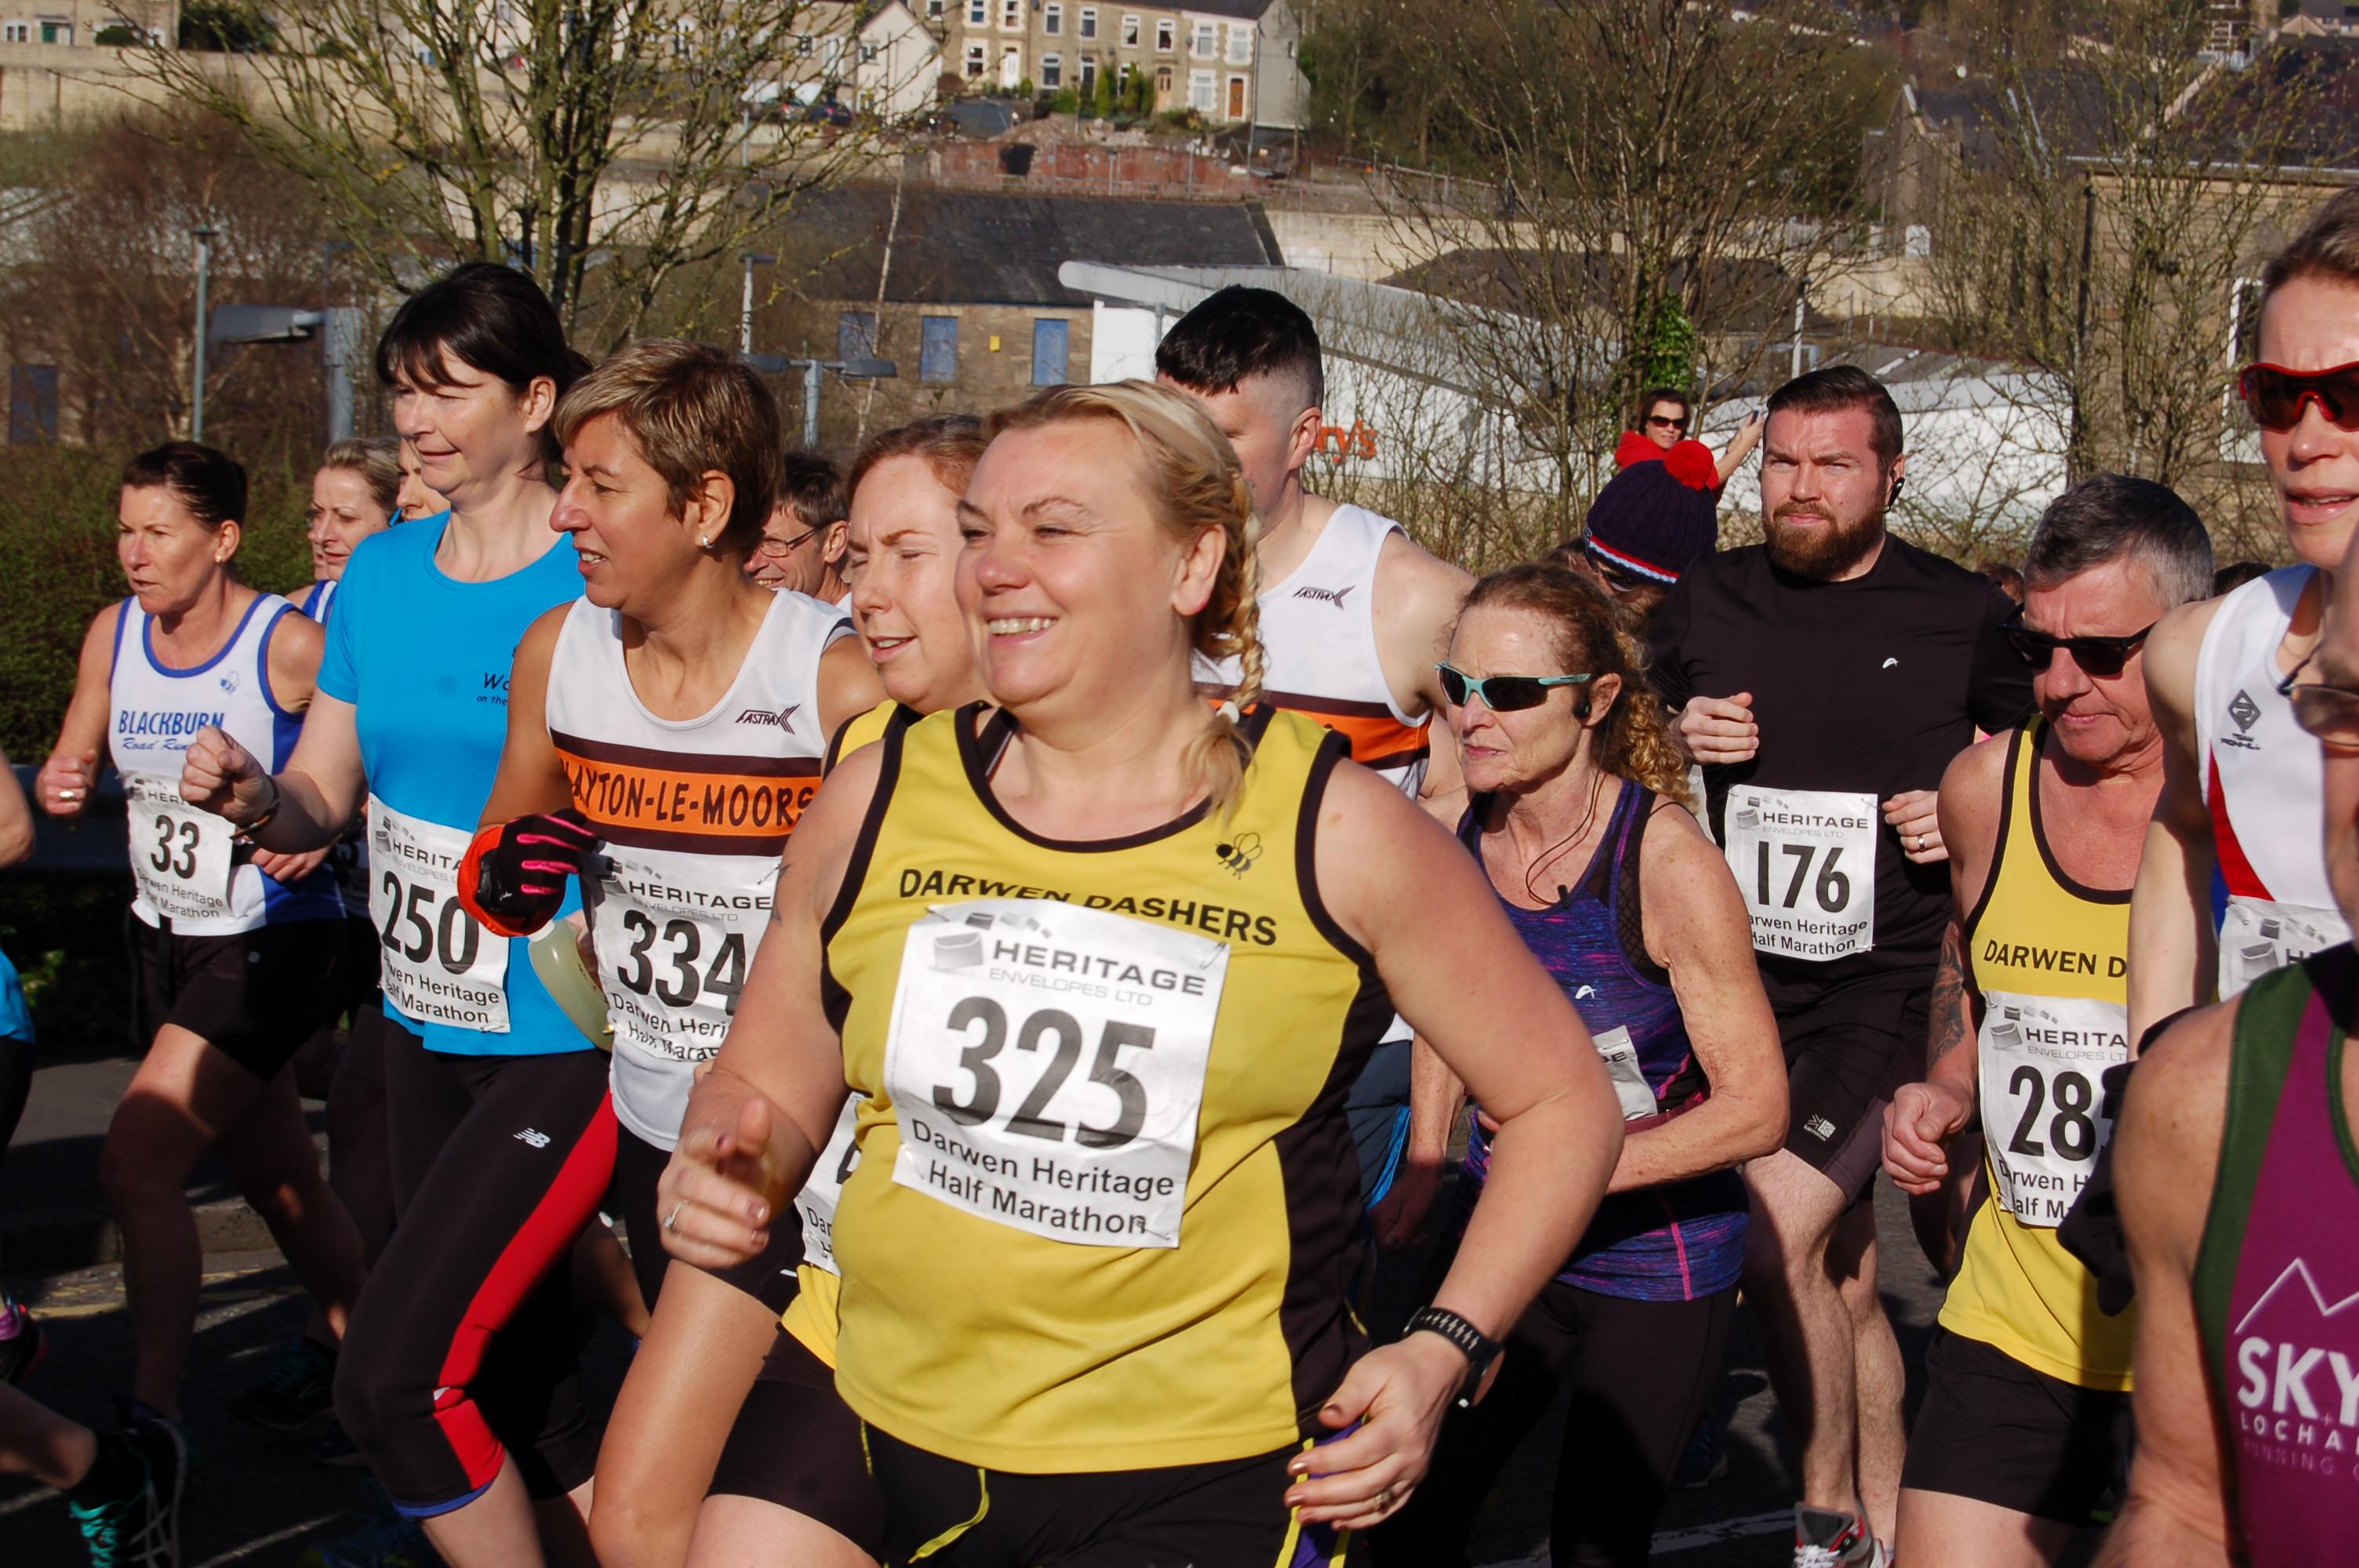 Darwen Heritage Half Marathon - cover image